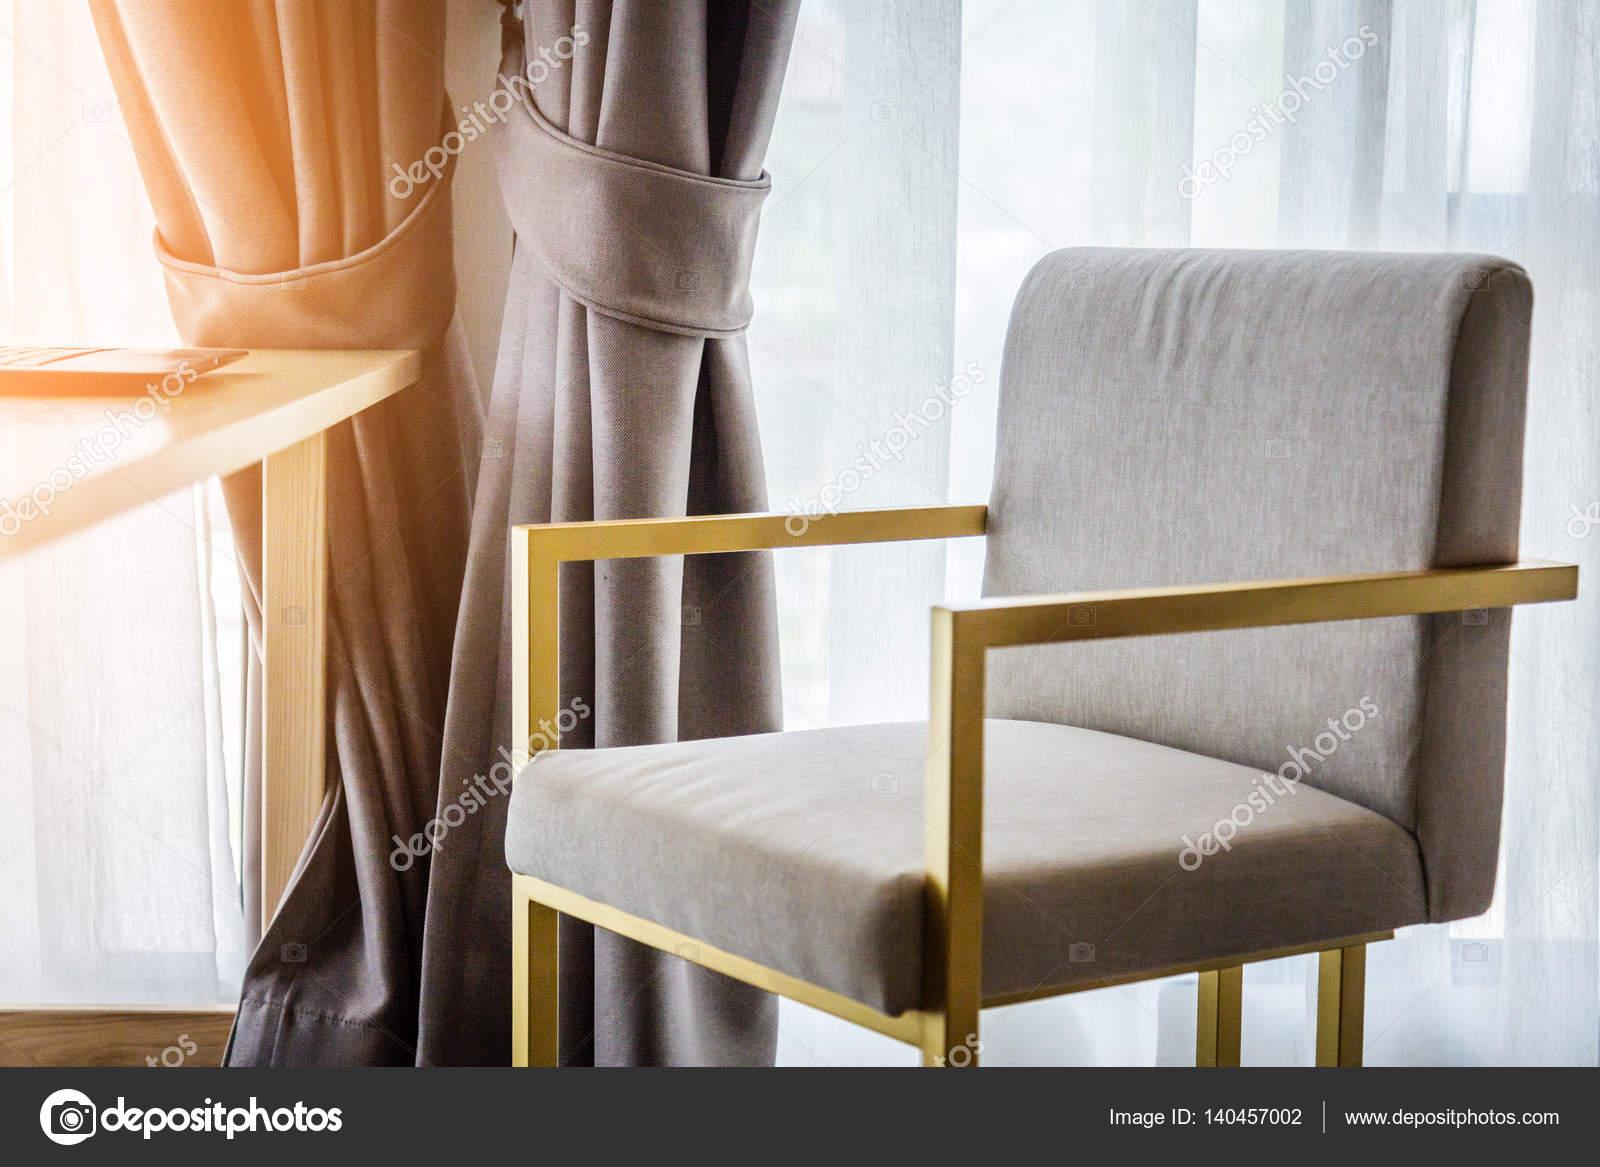 Home decoratie ontspanning woonkamer met beige kleur beklede stoel